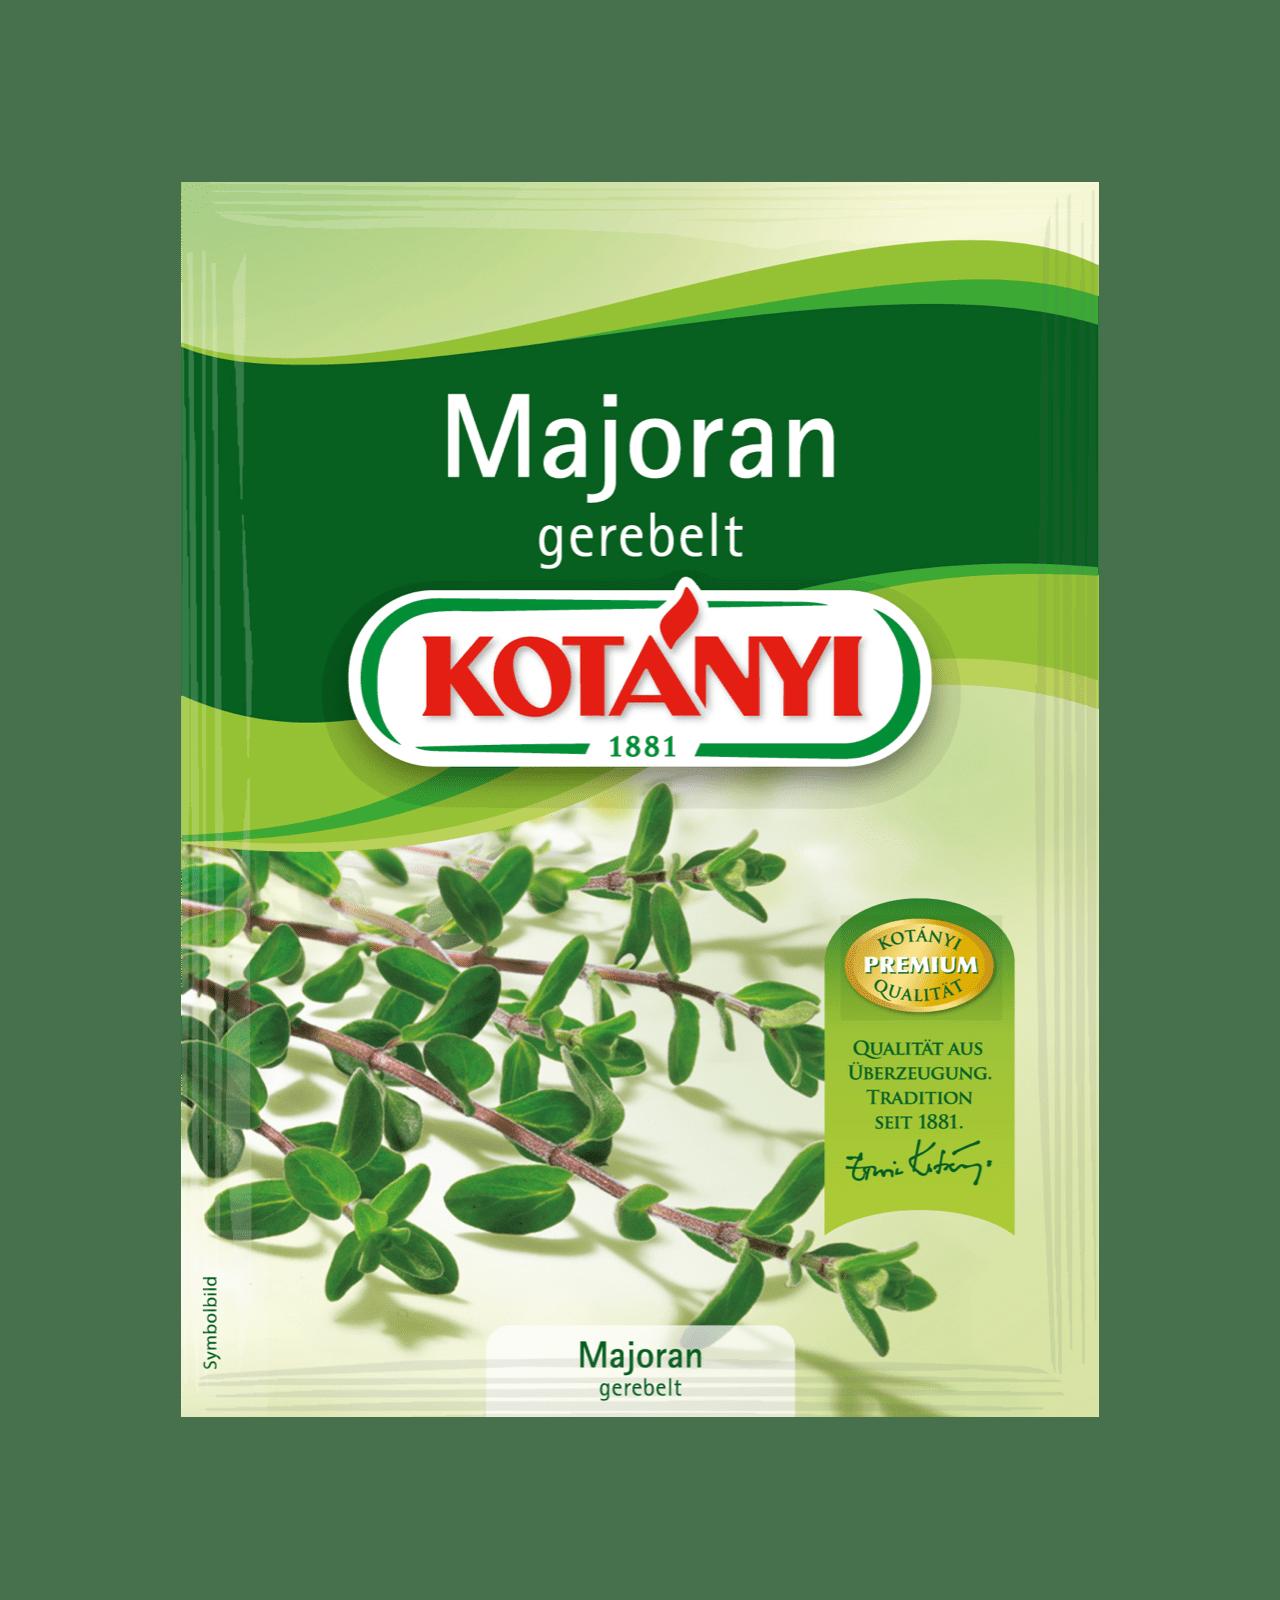 Kotányi Majoran gerebelt im Brief